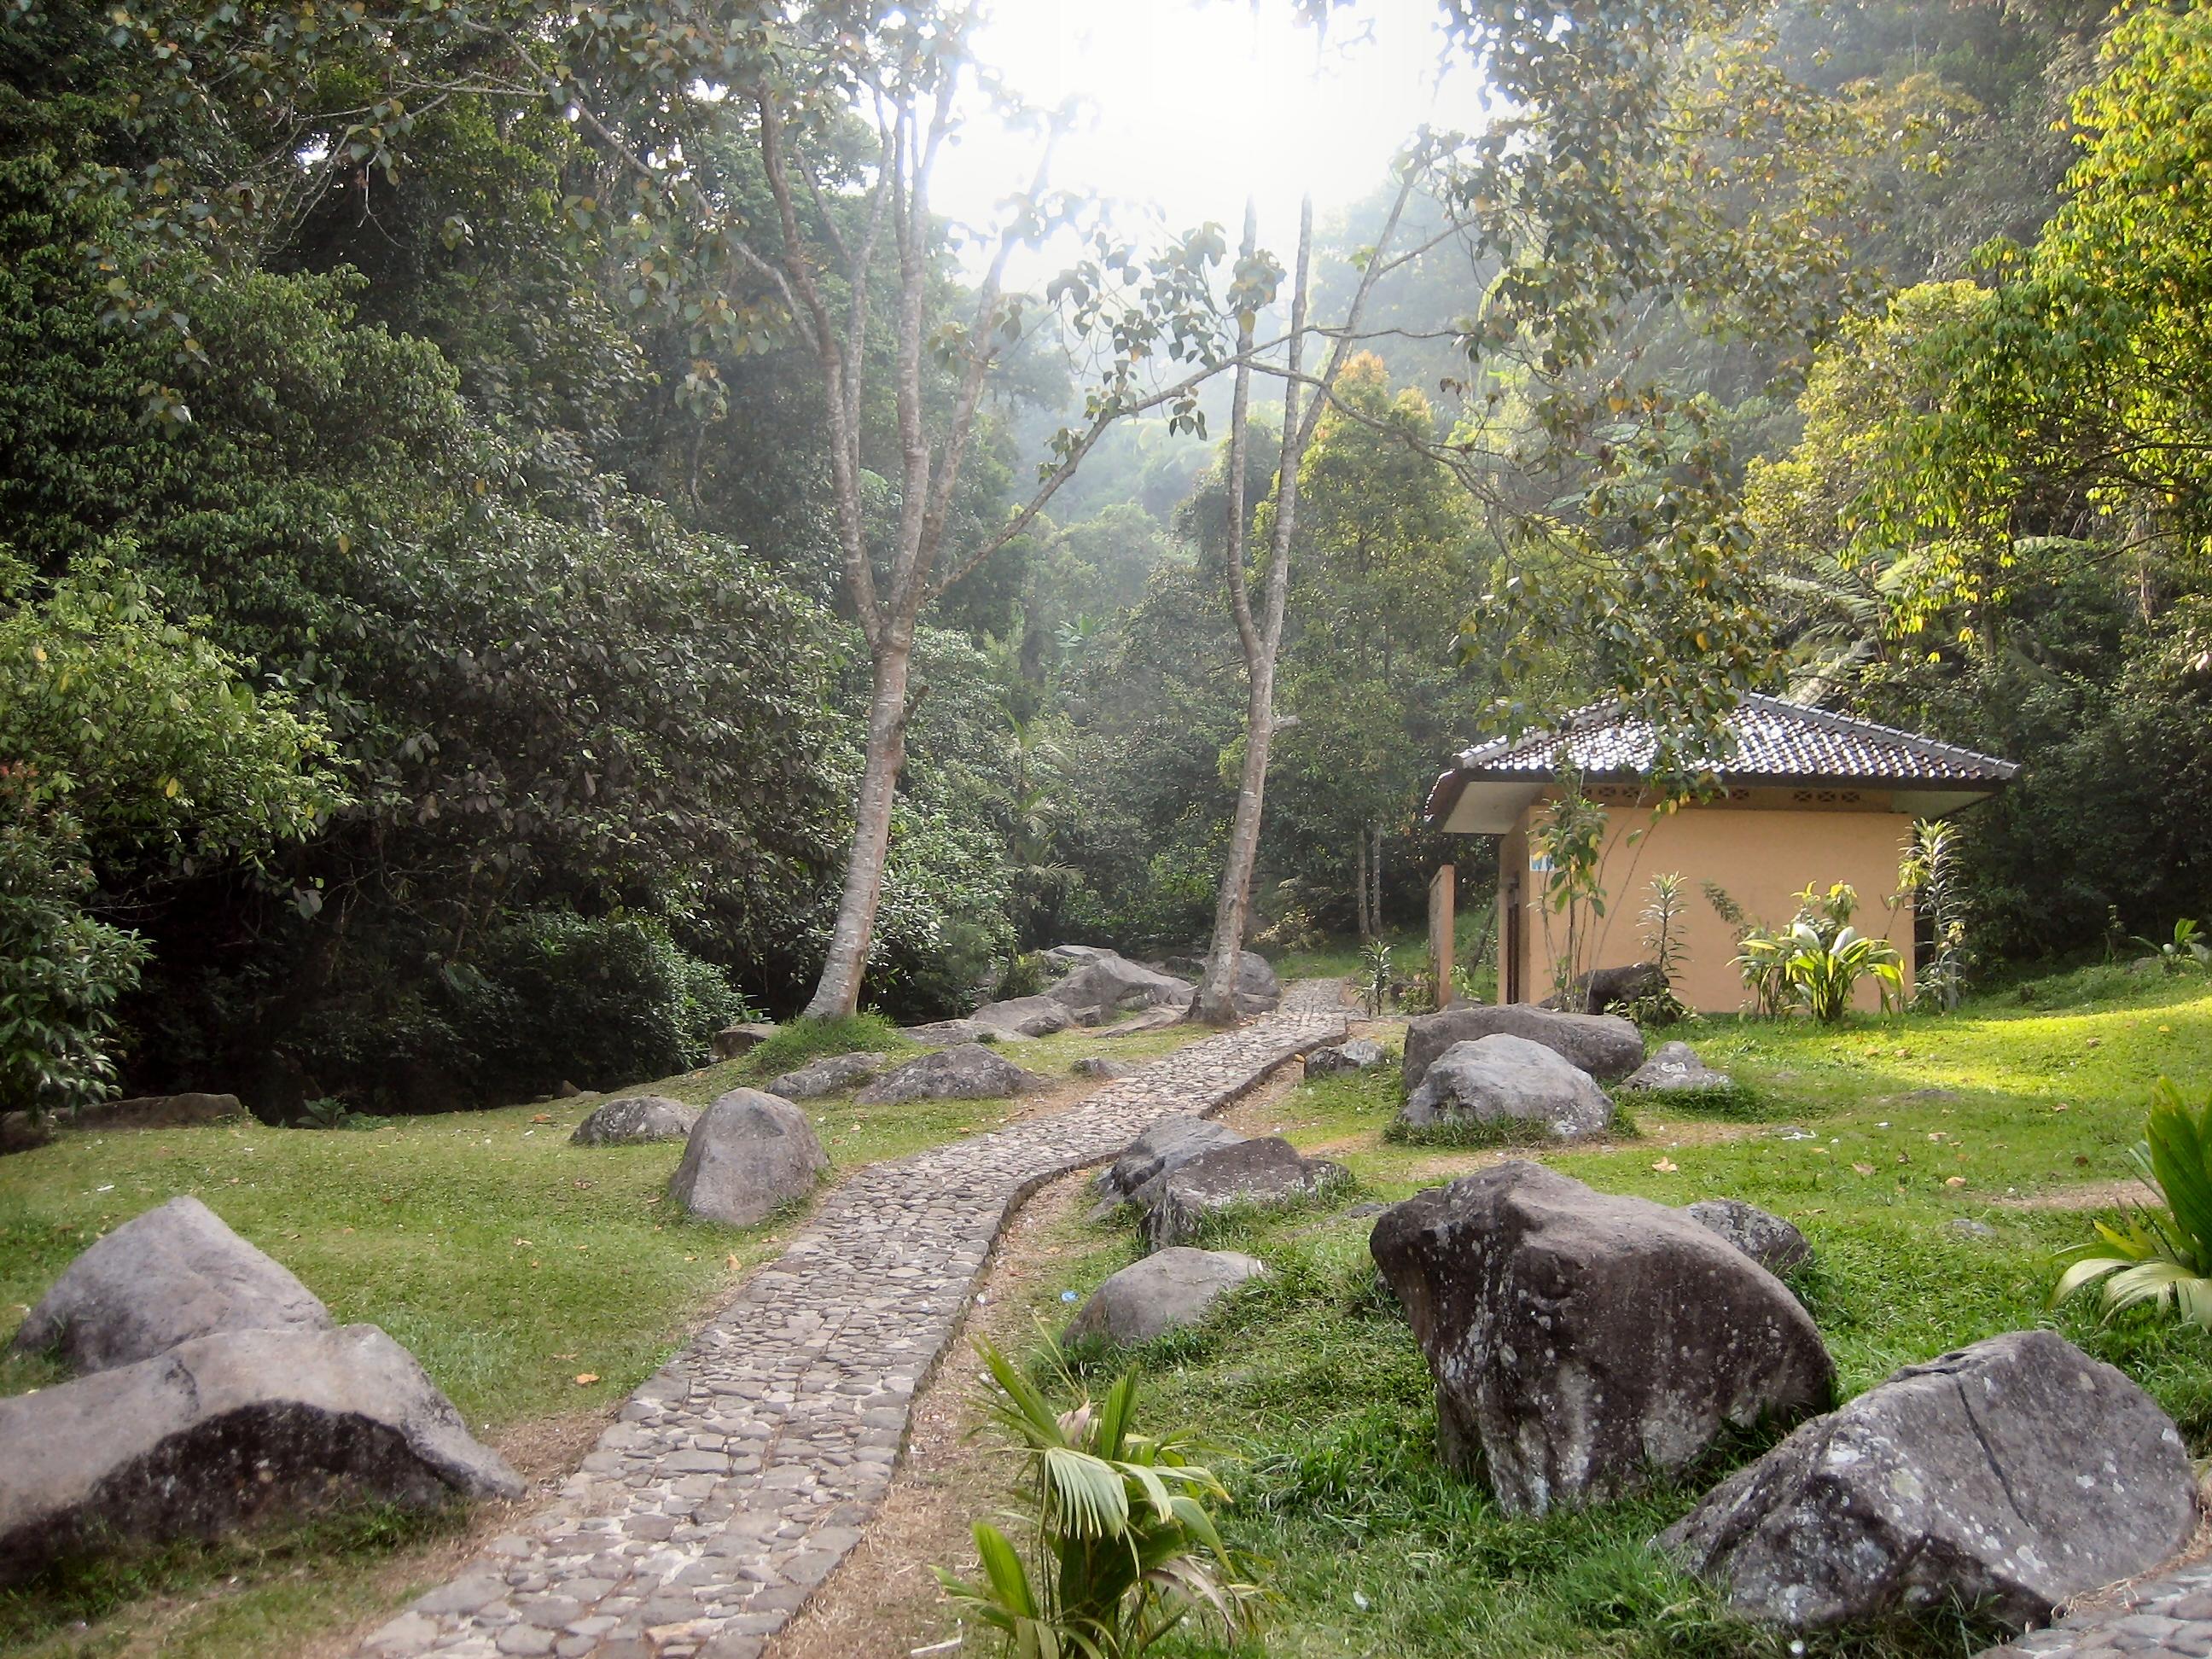 Kebun Raya Cibodas Wikipedia Bahasa Indonesia